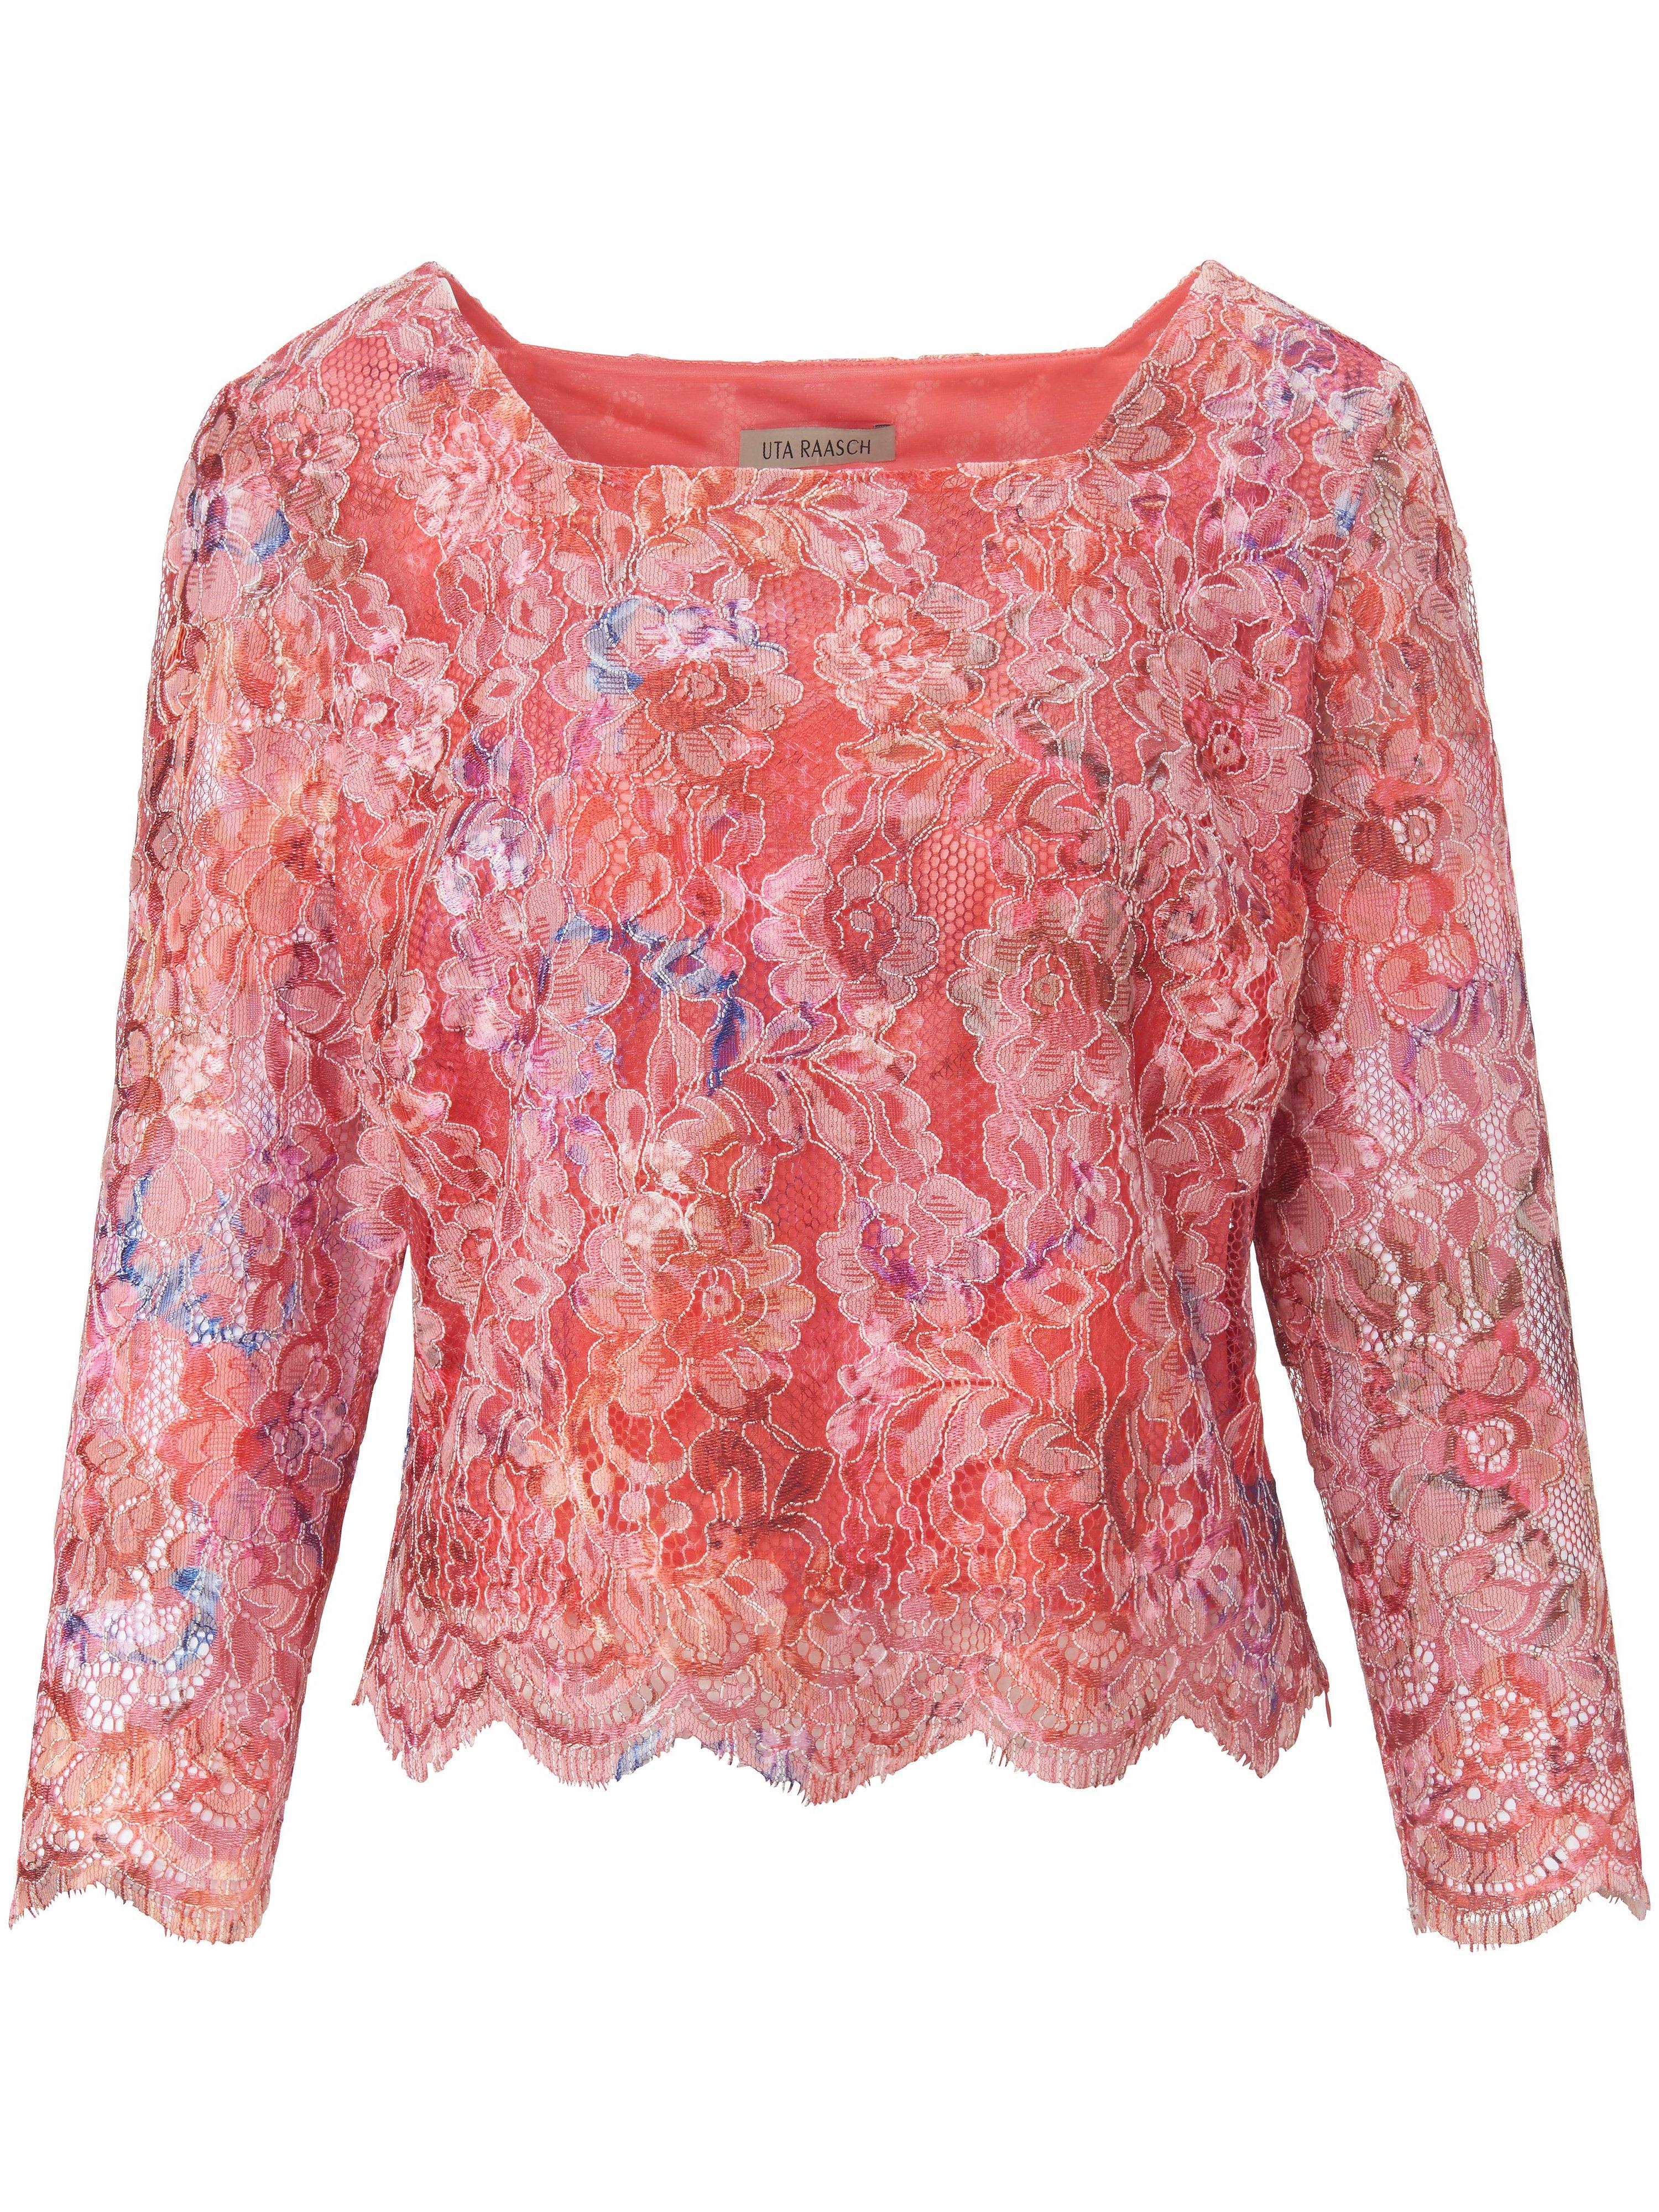 Kanten blouse 3/4-mouwen Van Uta Raasch multicolour